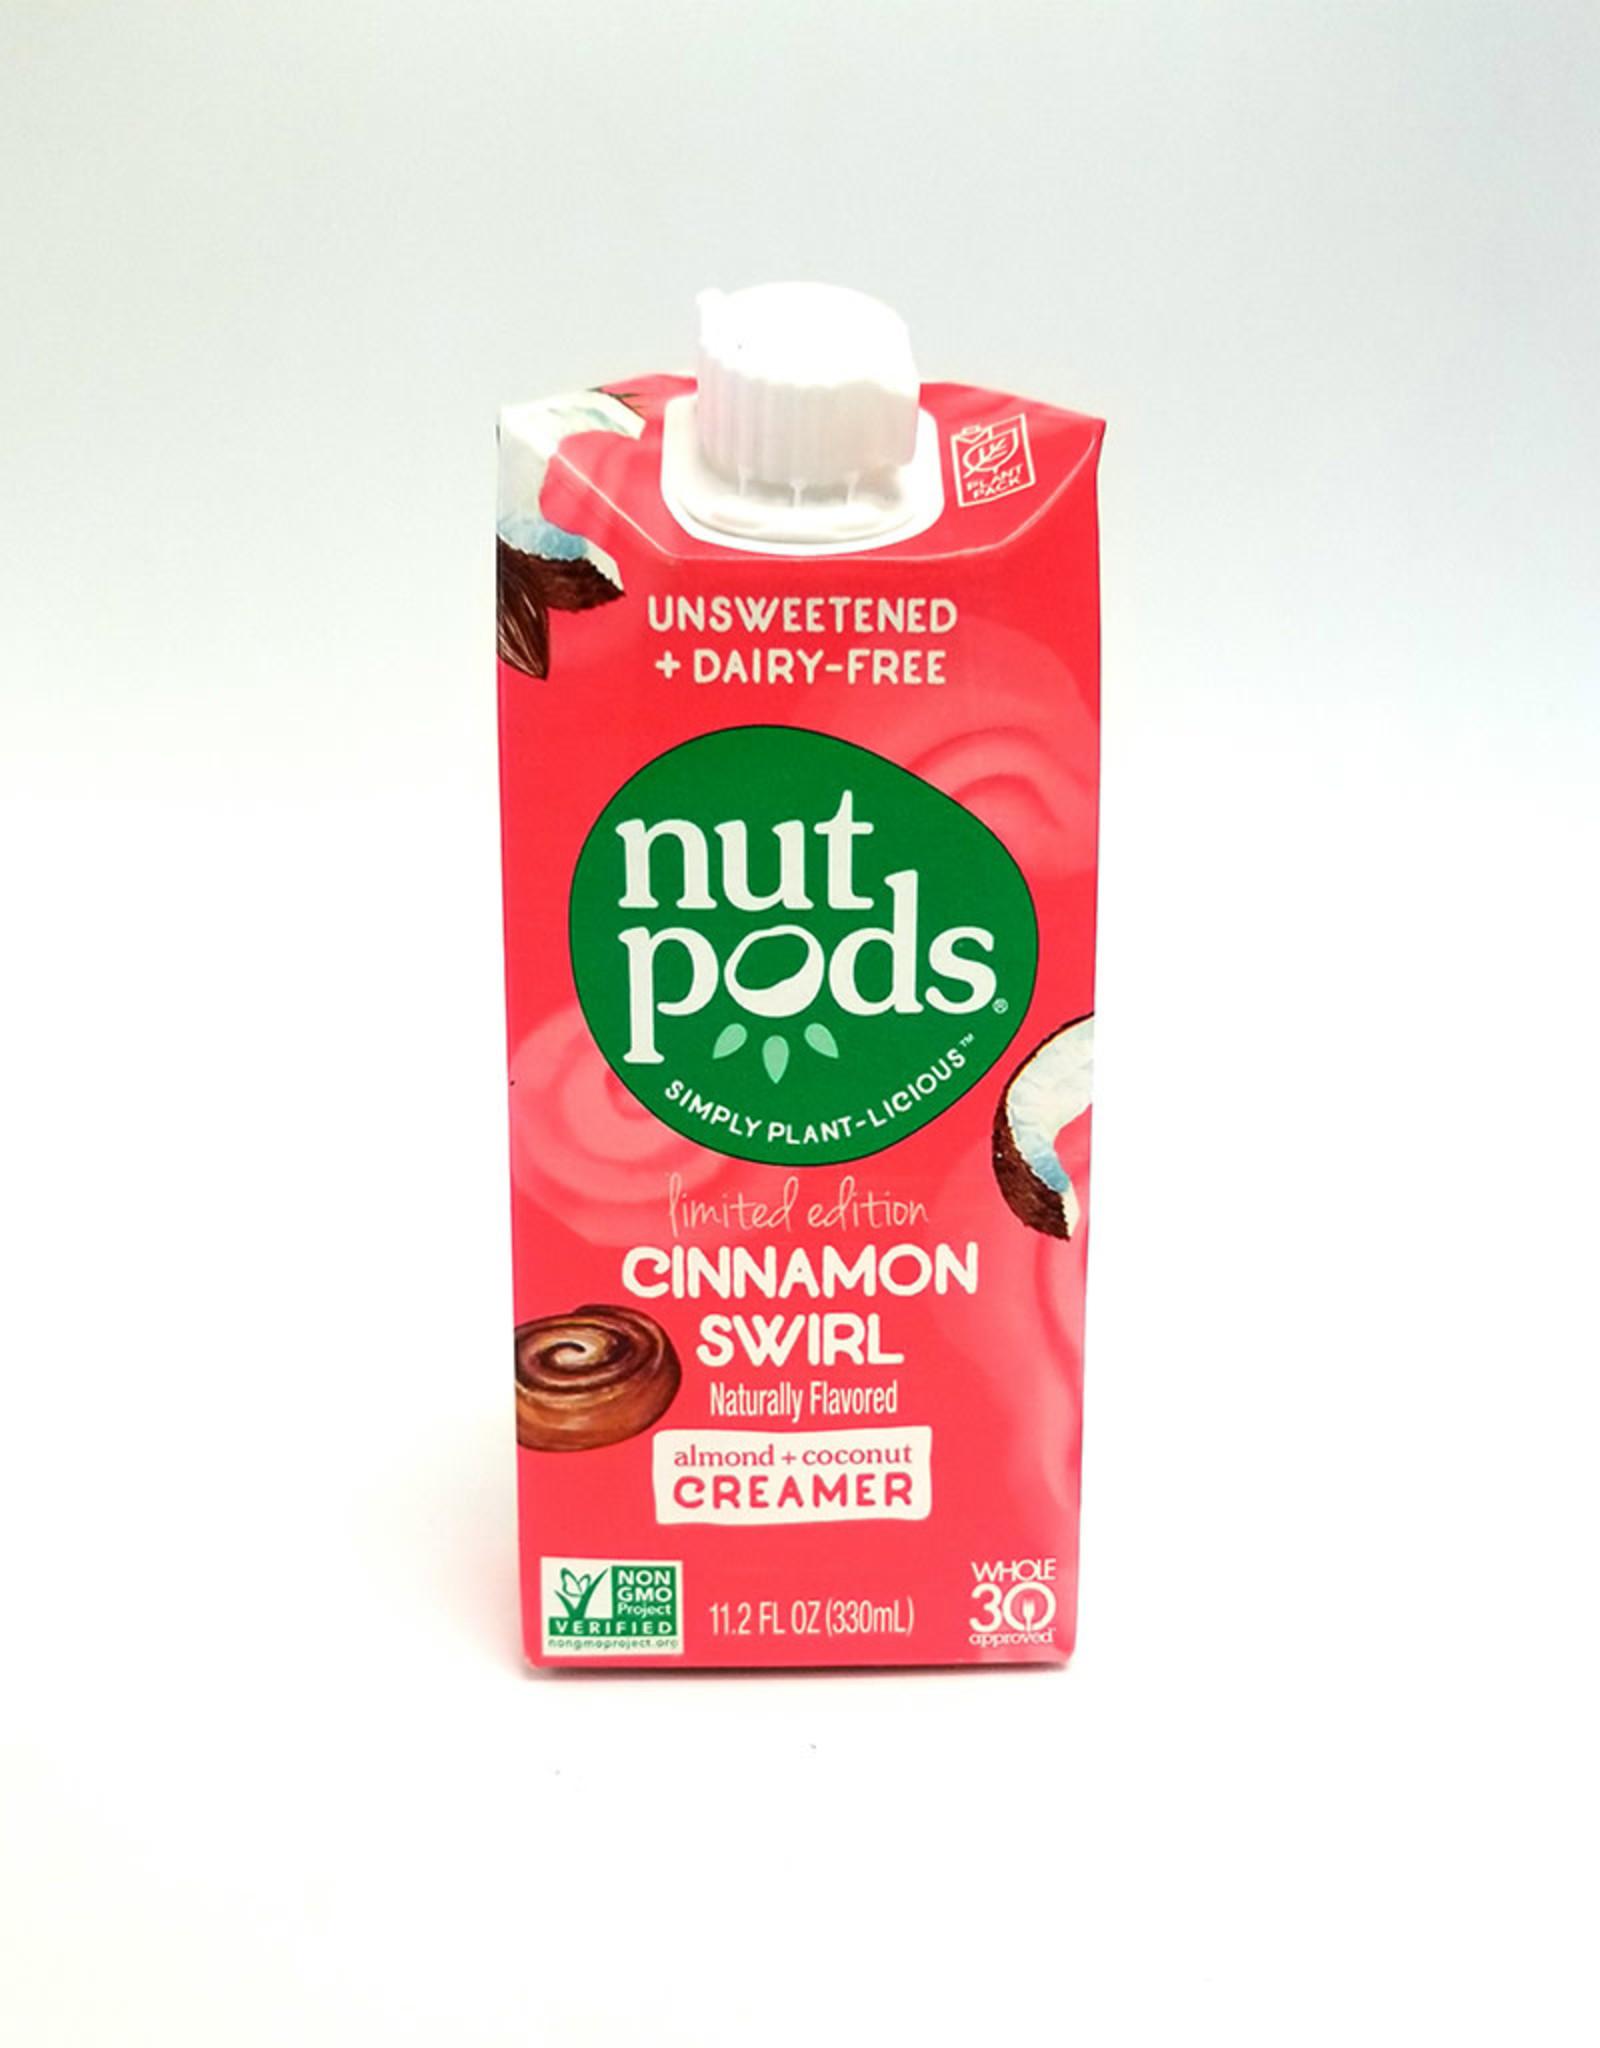 Nutpods Nutpods - Unsweetened Dairy-Free Creamer, Cinnamon Swirl (330ml)